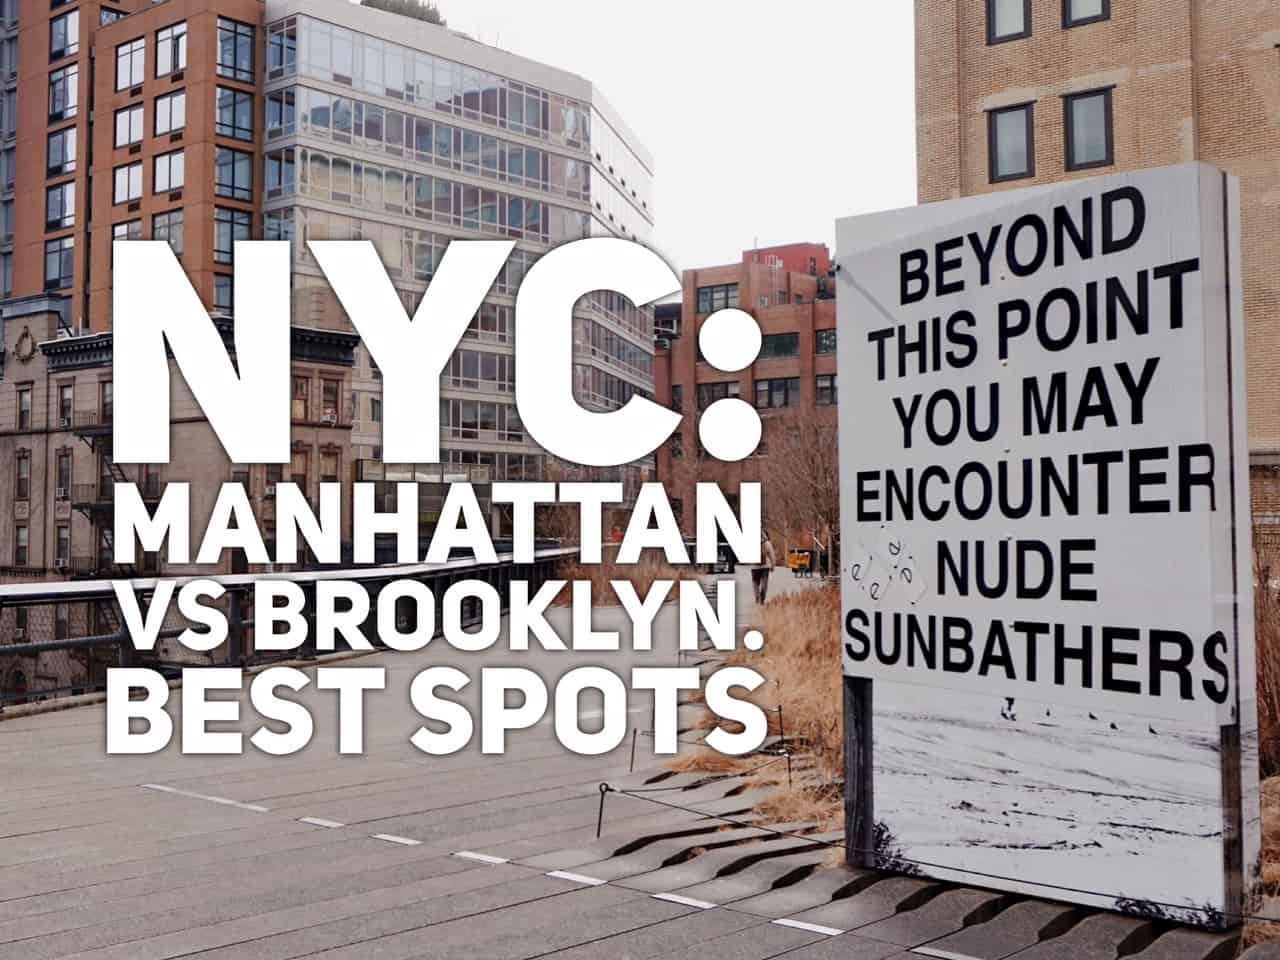 Manhattan vs Brooklyn - great spots to visit in NYC | Tripsget